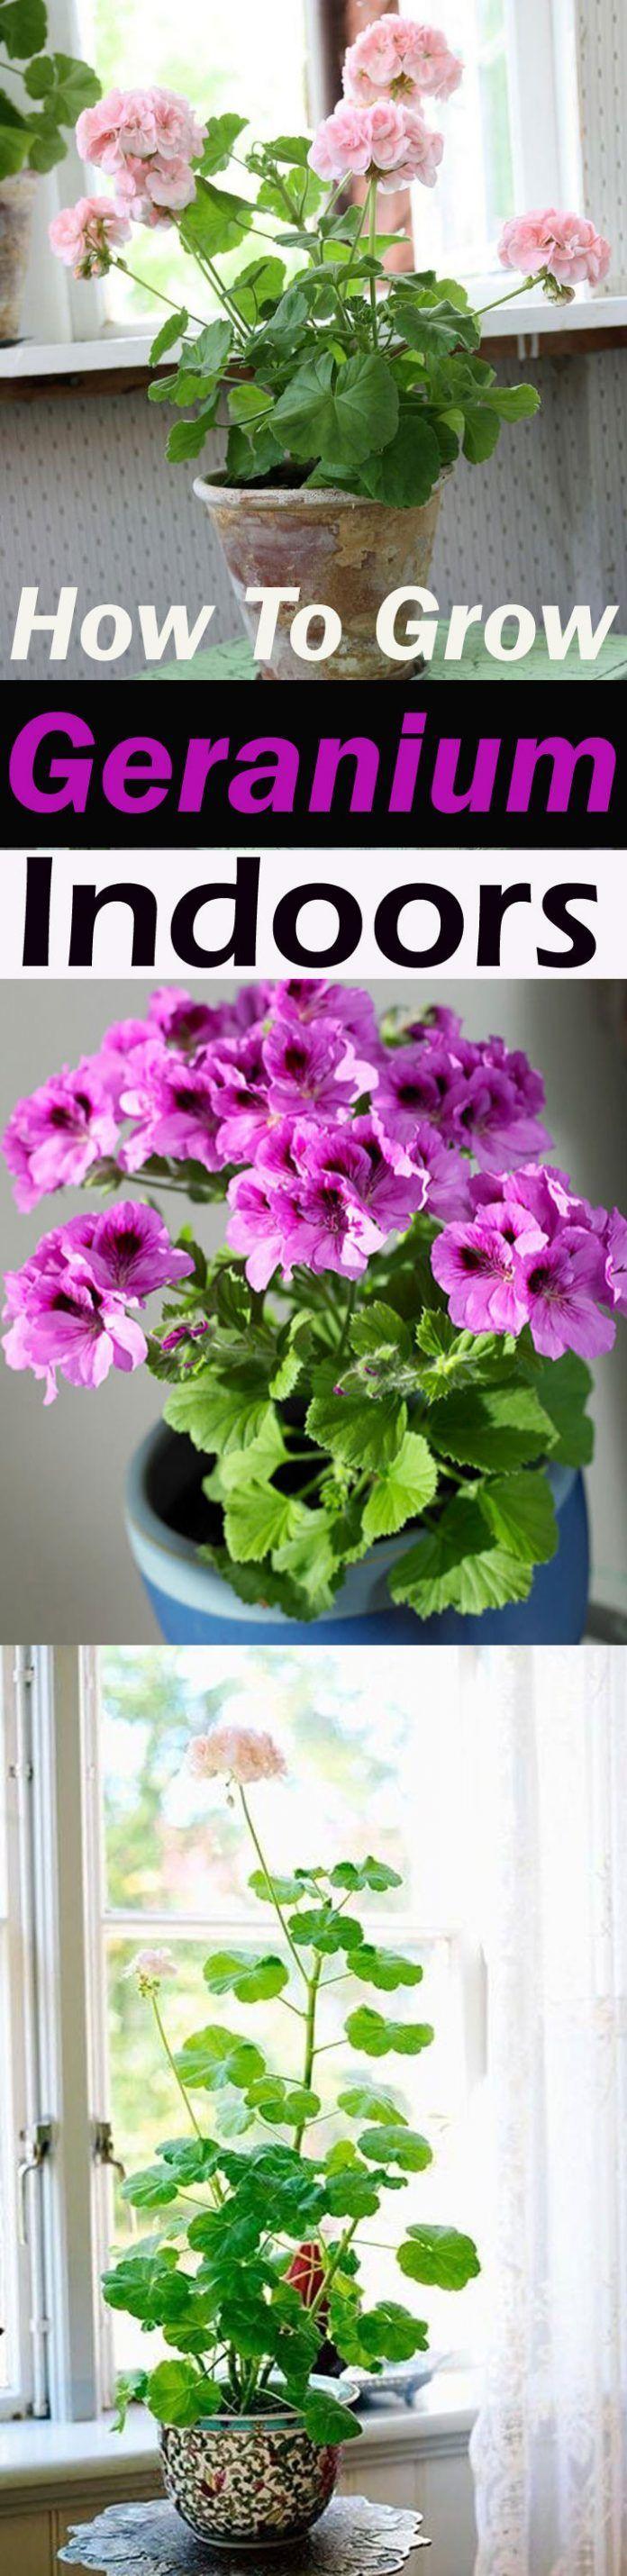 How to Grow Geranium Indoors Year Round